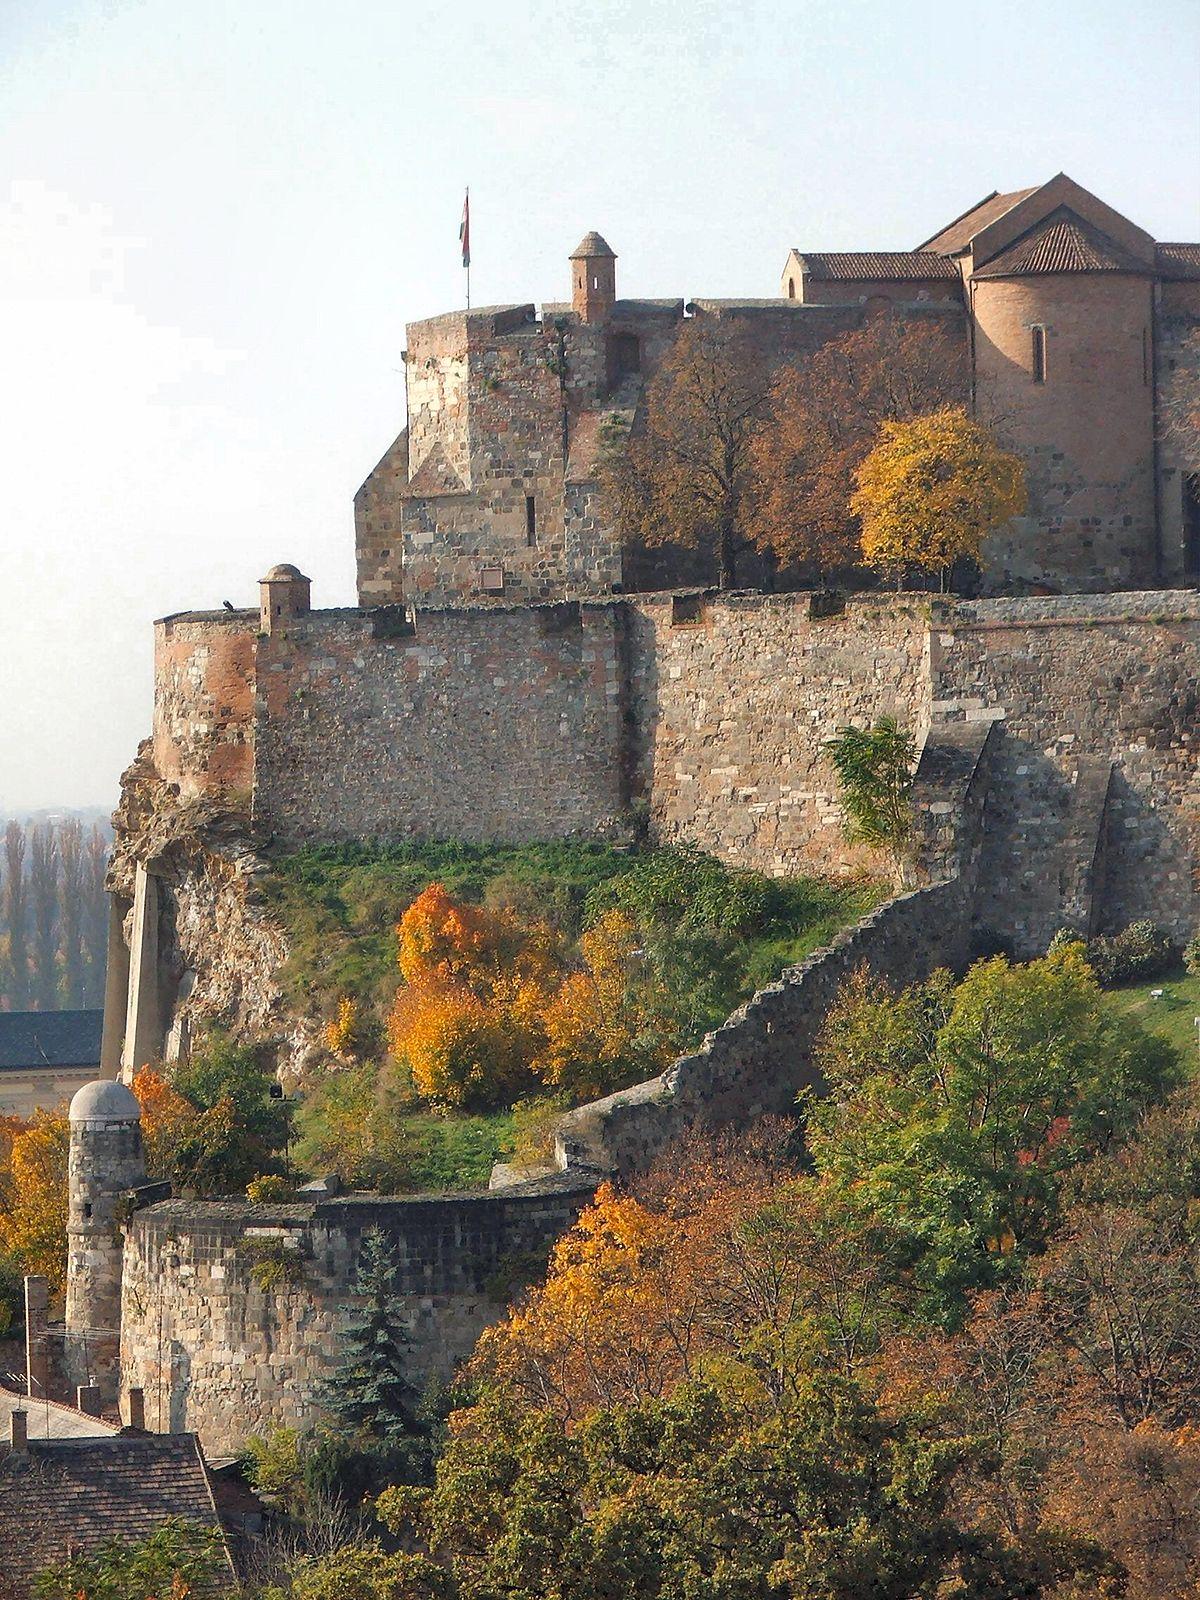 Kom 225 Rom Esztergom County Travel Guide At Wikivoyage